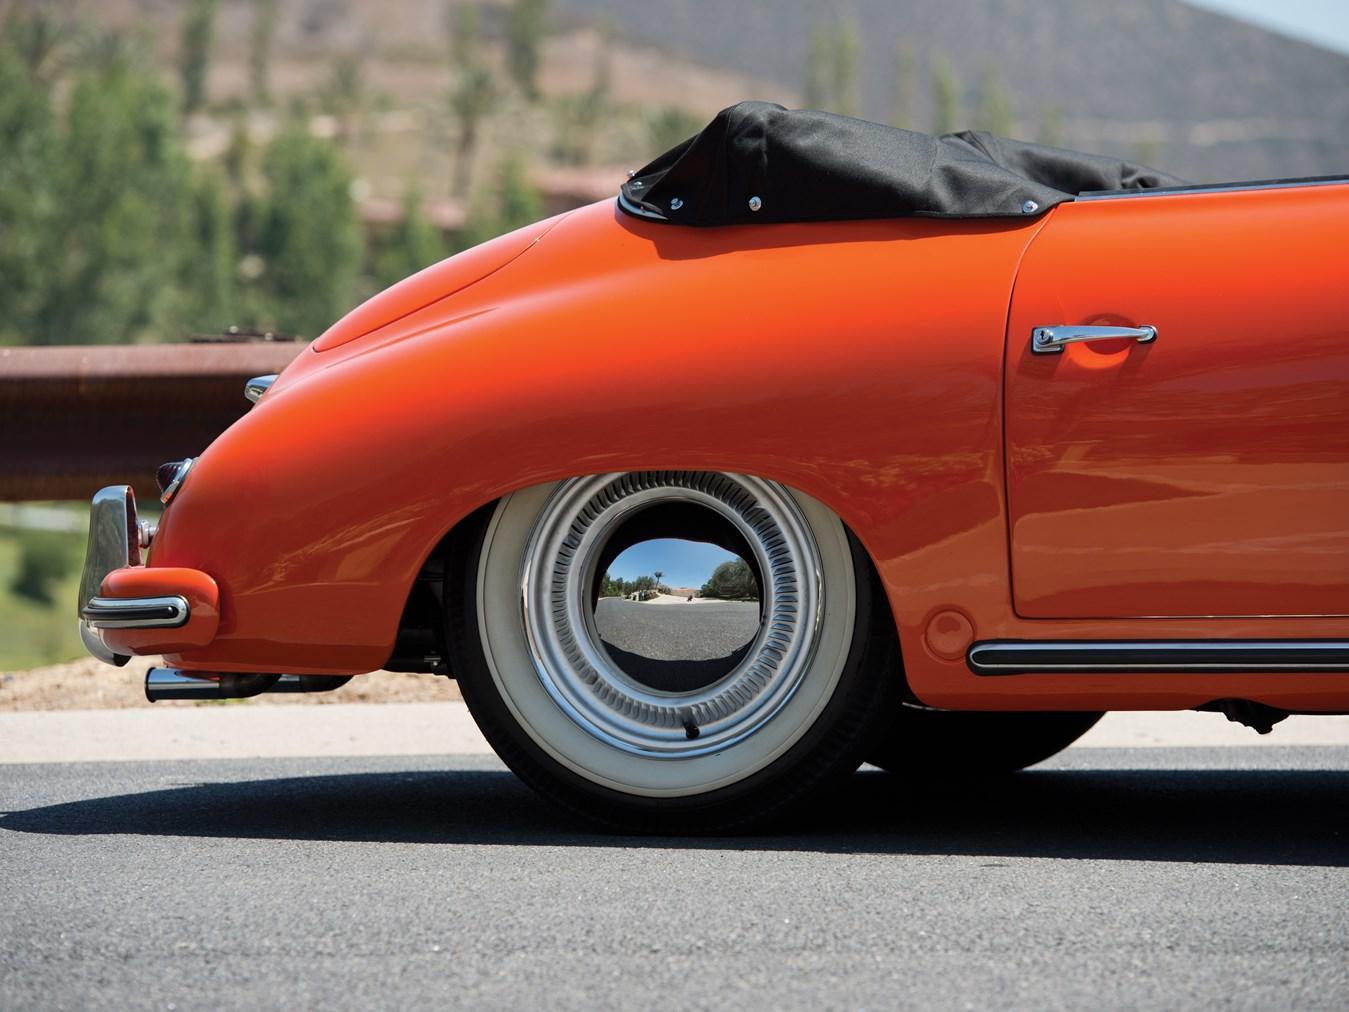 1955 Porsche 356 Pre-A 1500 Continental Cabriolet by Reutter